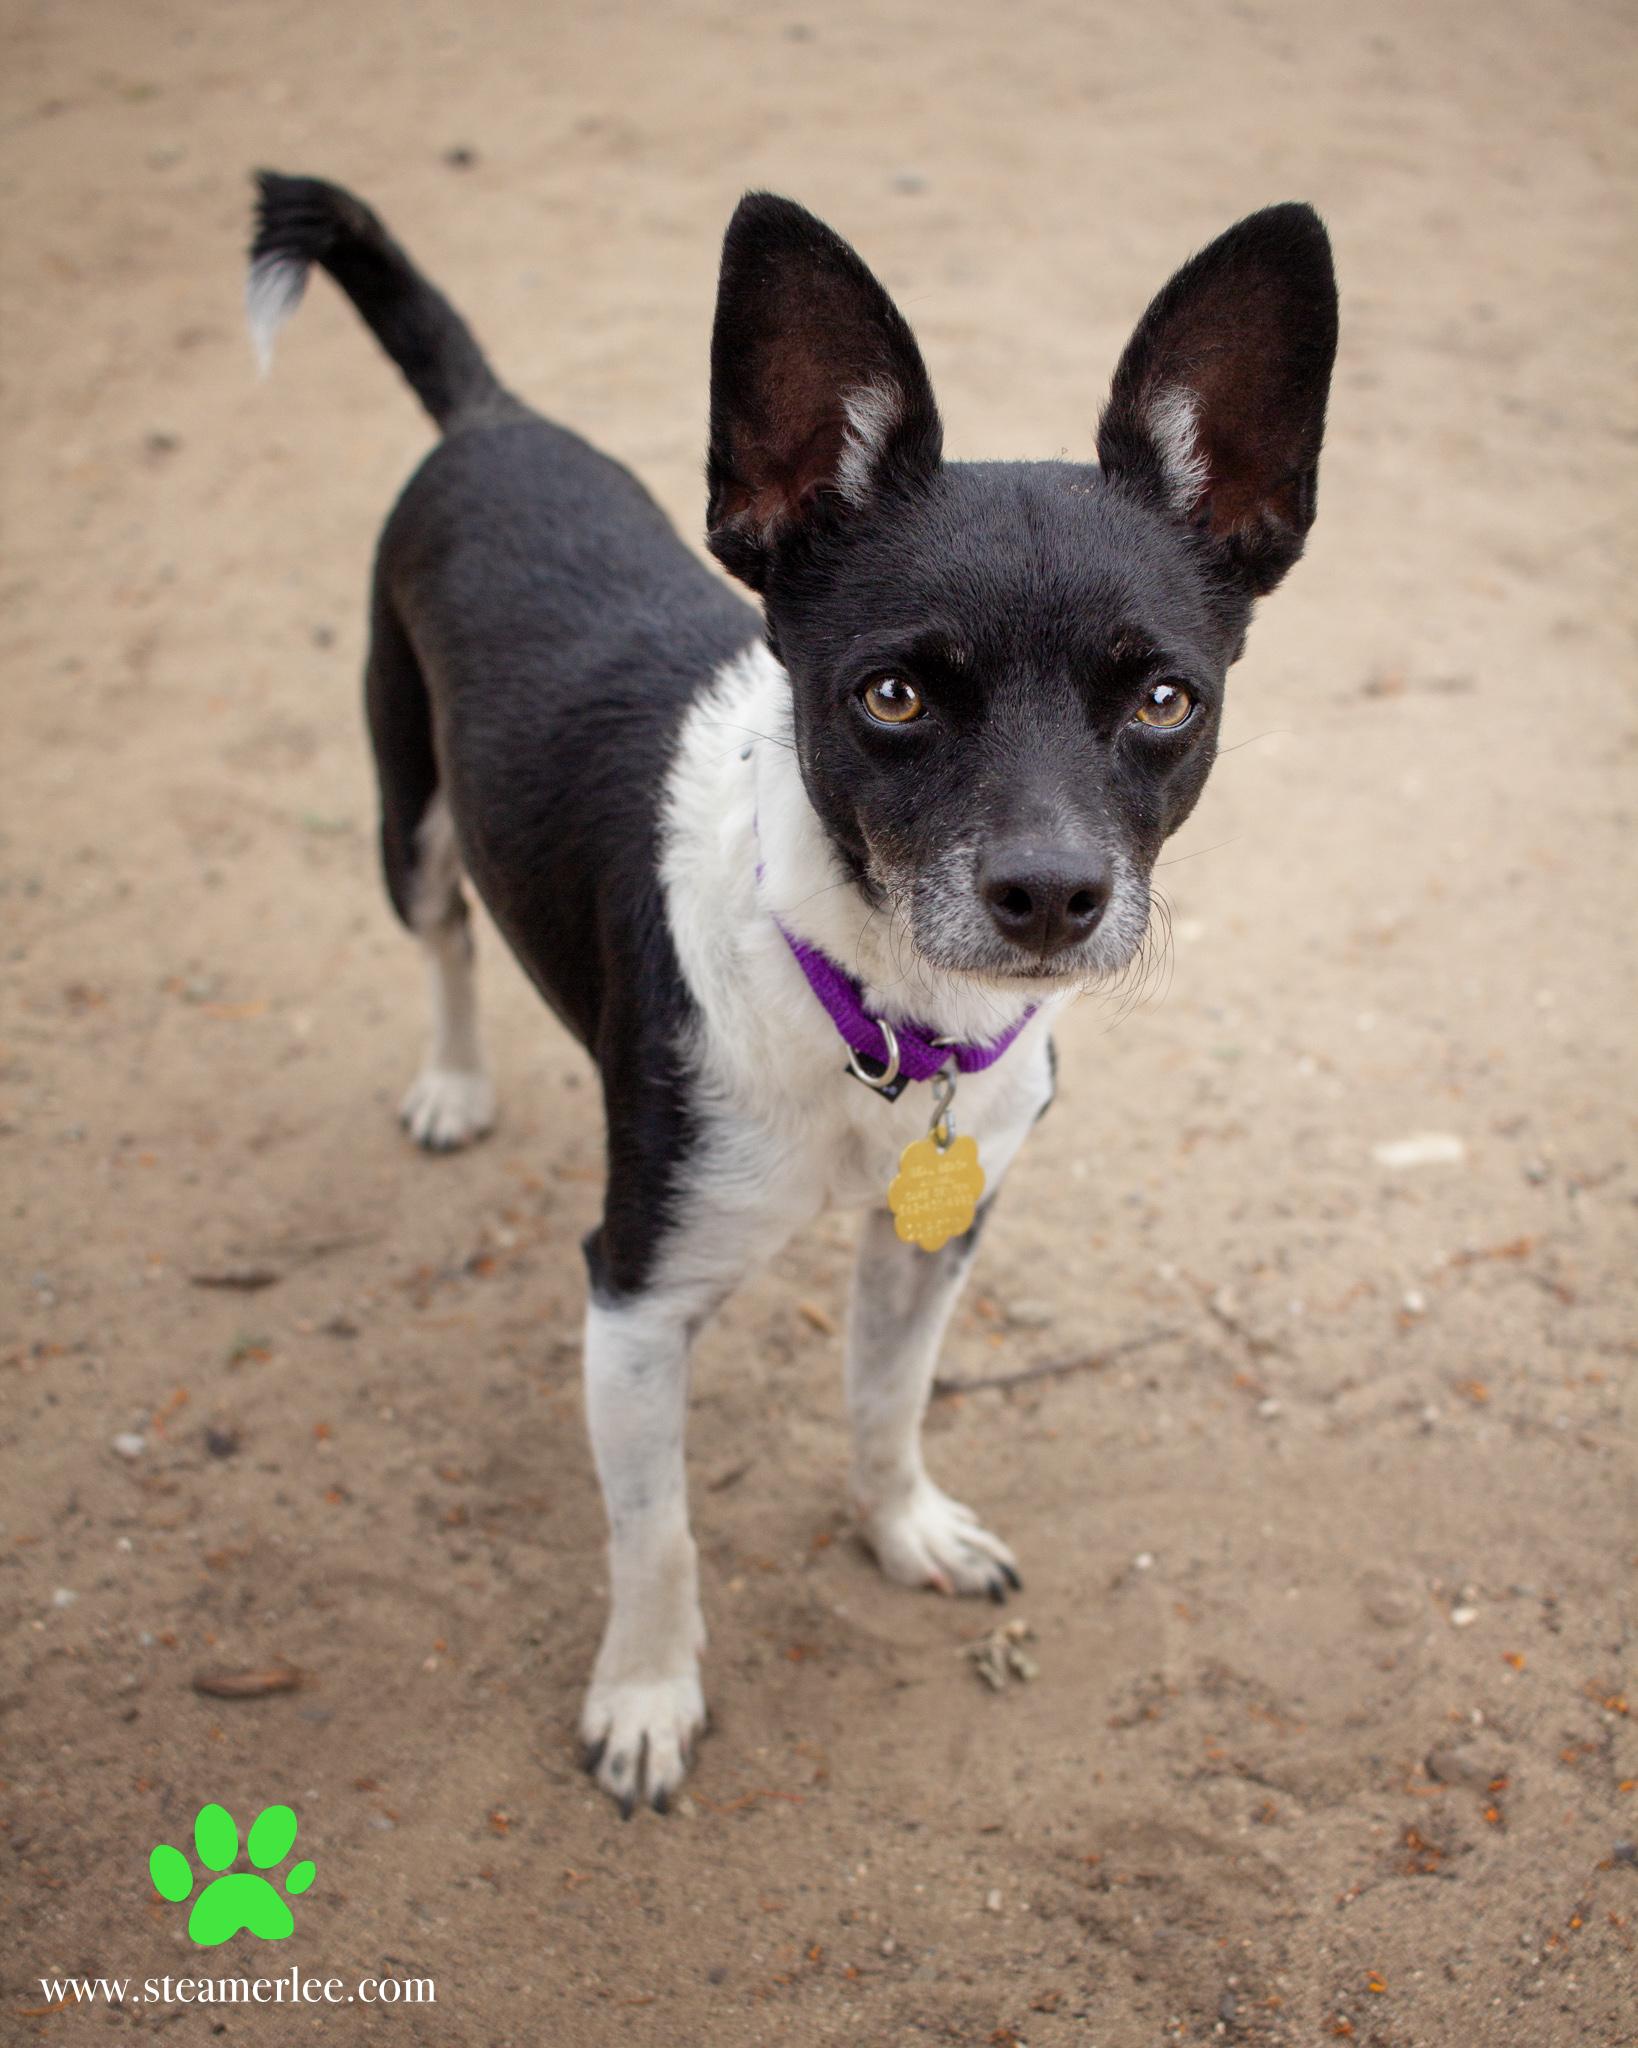 357-Orange-County-Dog-Photography-Steamer-Lee-Southern-California-SBACC.JPG